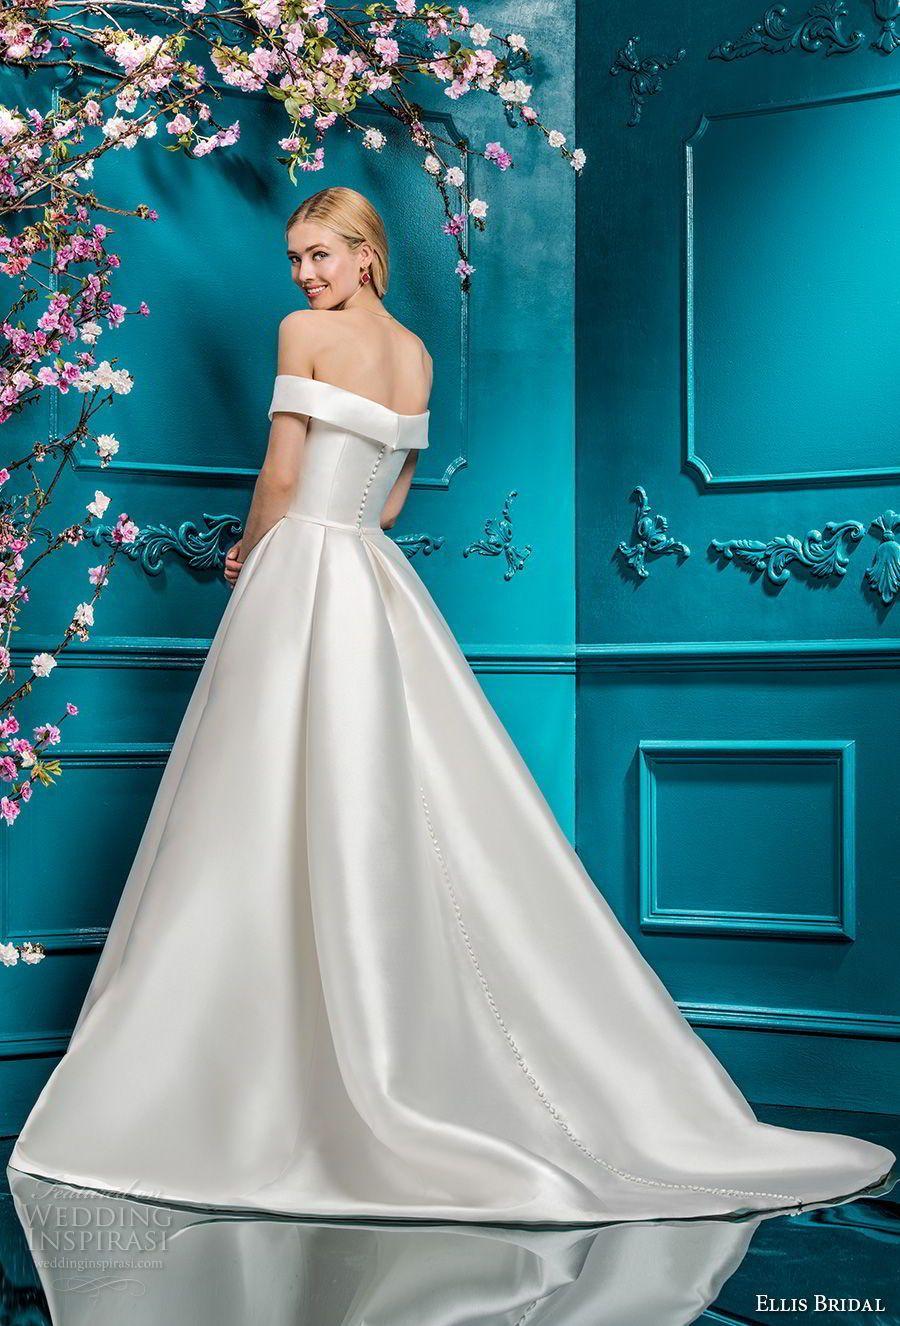 Ellis bridals off the shoulder straight across simple clean